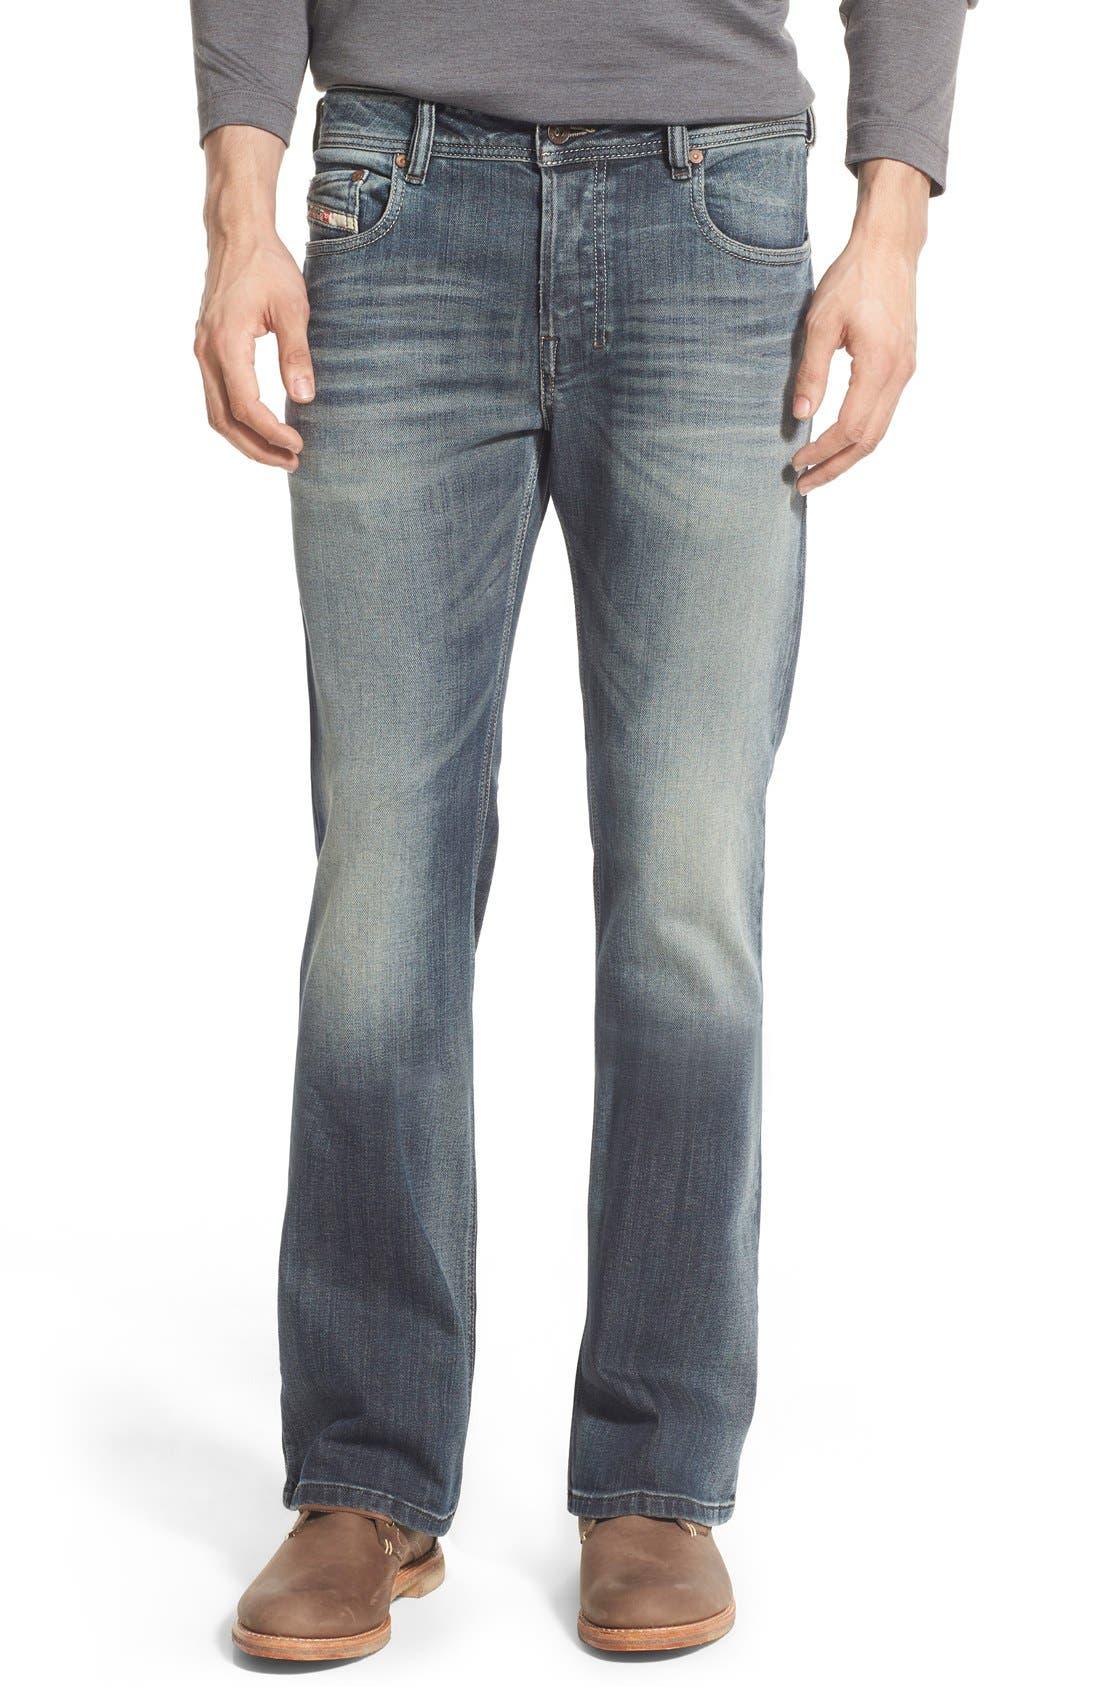 'Zathan' Bootcut Jeans,                         Main,                         color, 885K